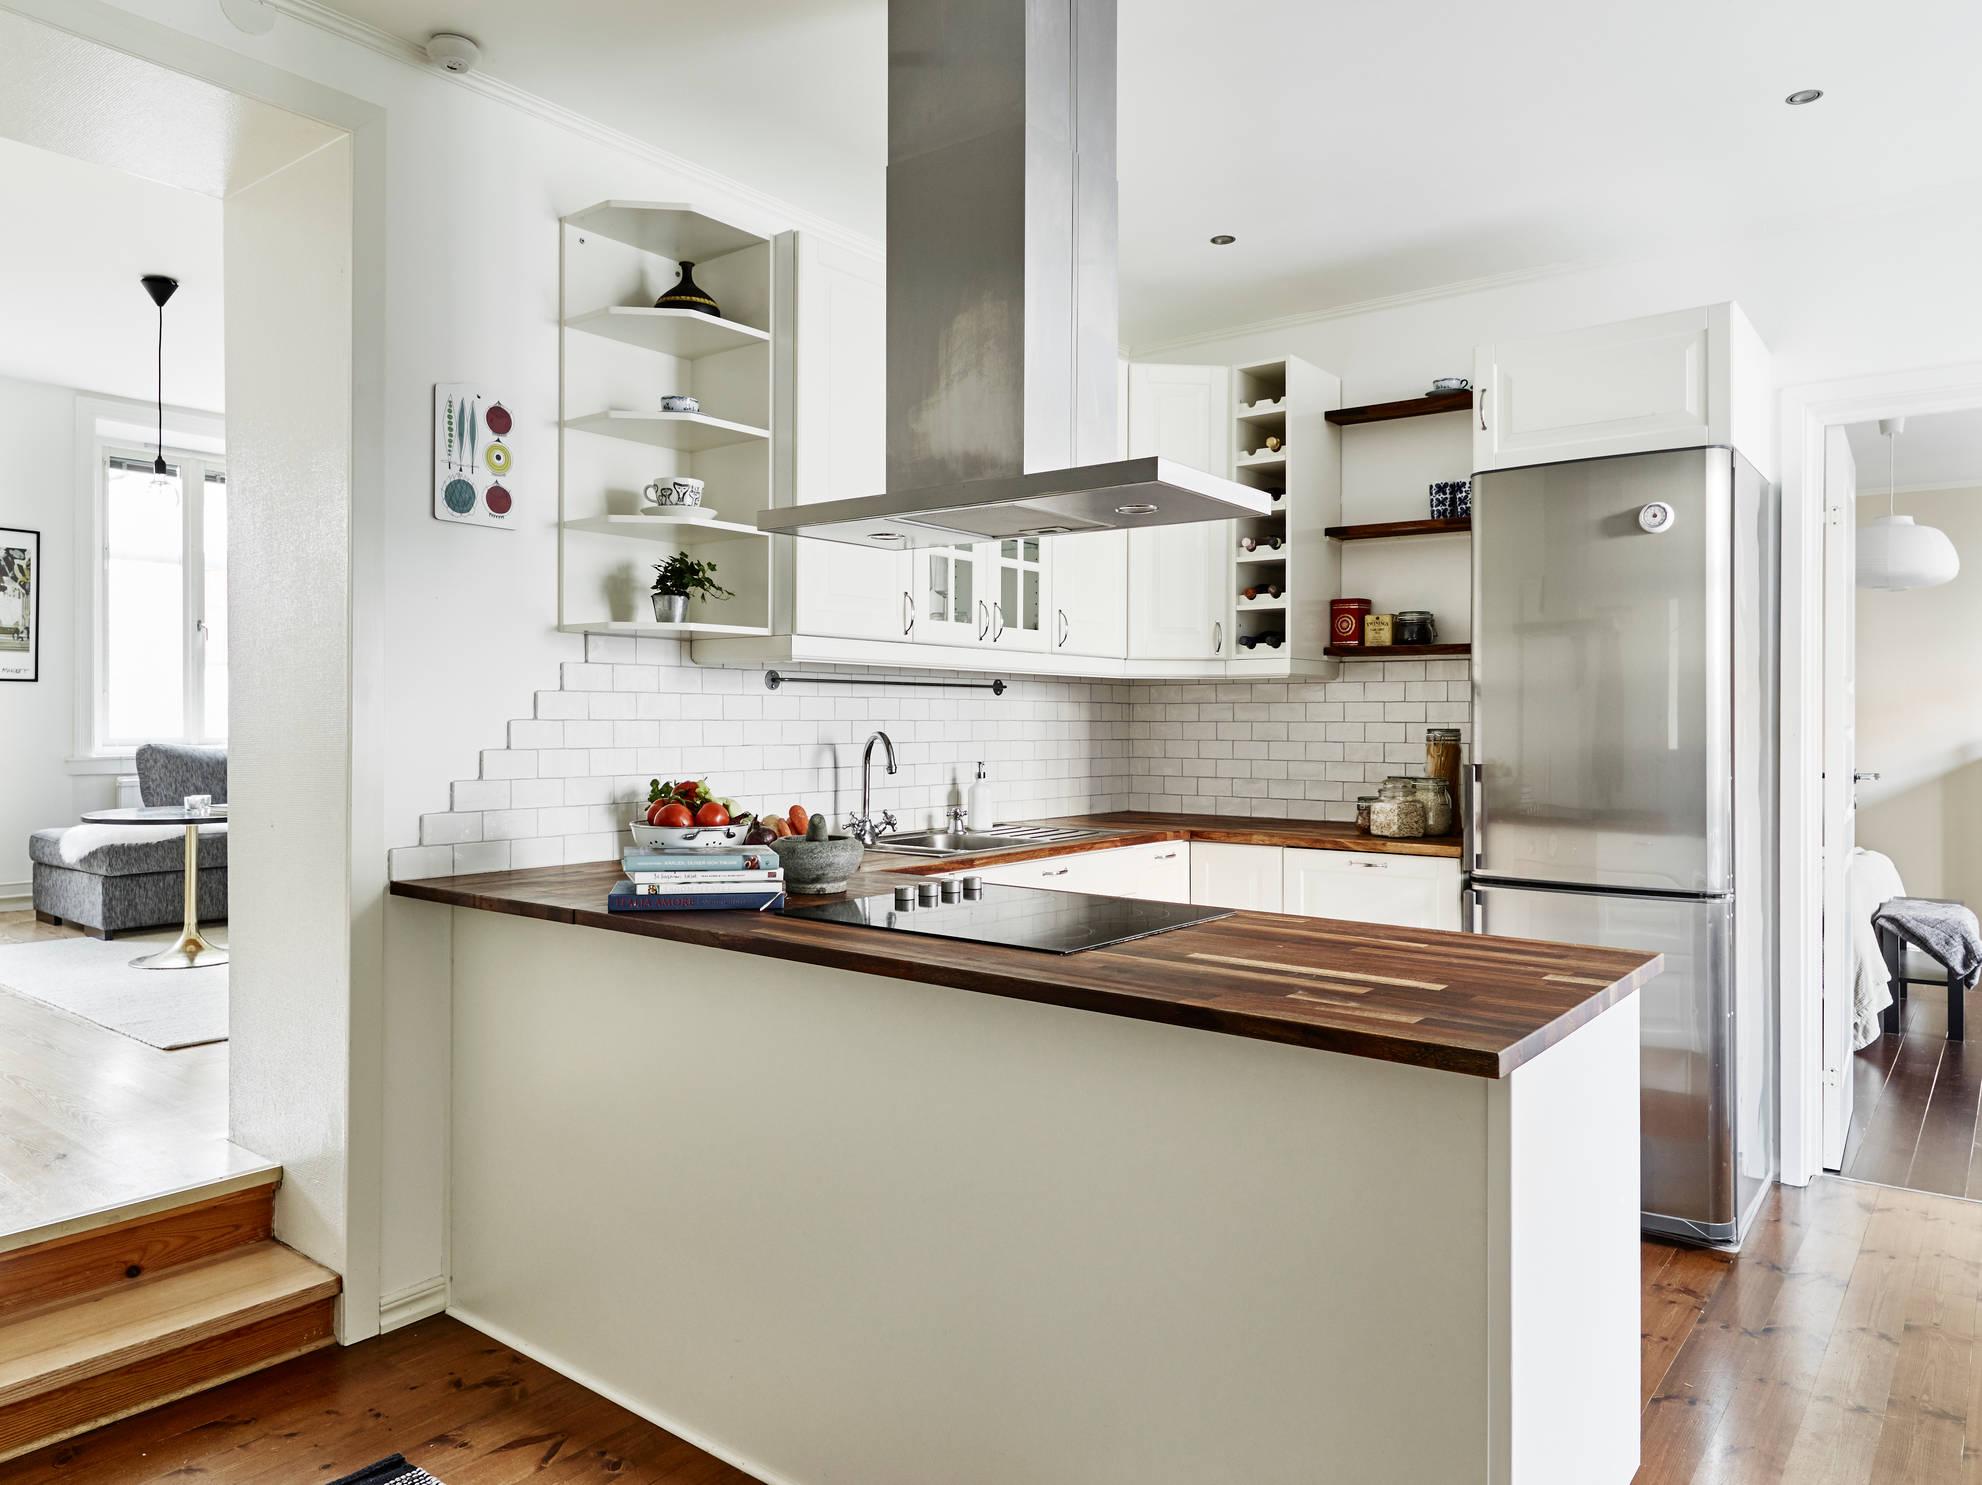 Como decorar un piso de 90 metros cuadrados como decorar - Cuanto cuesta pintar un piso de 60 metros cuadrados ...